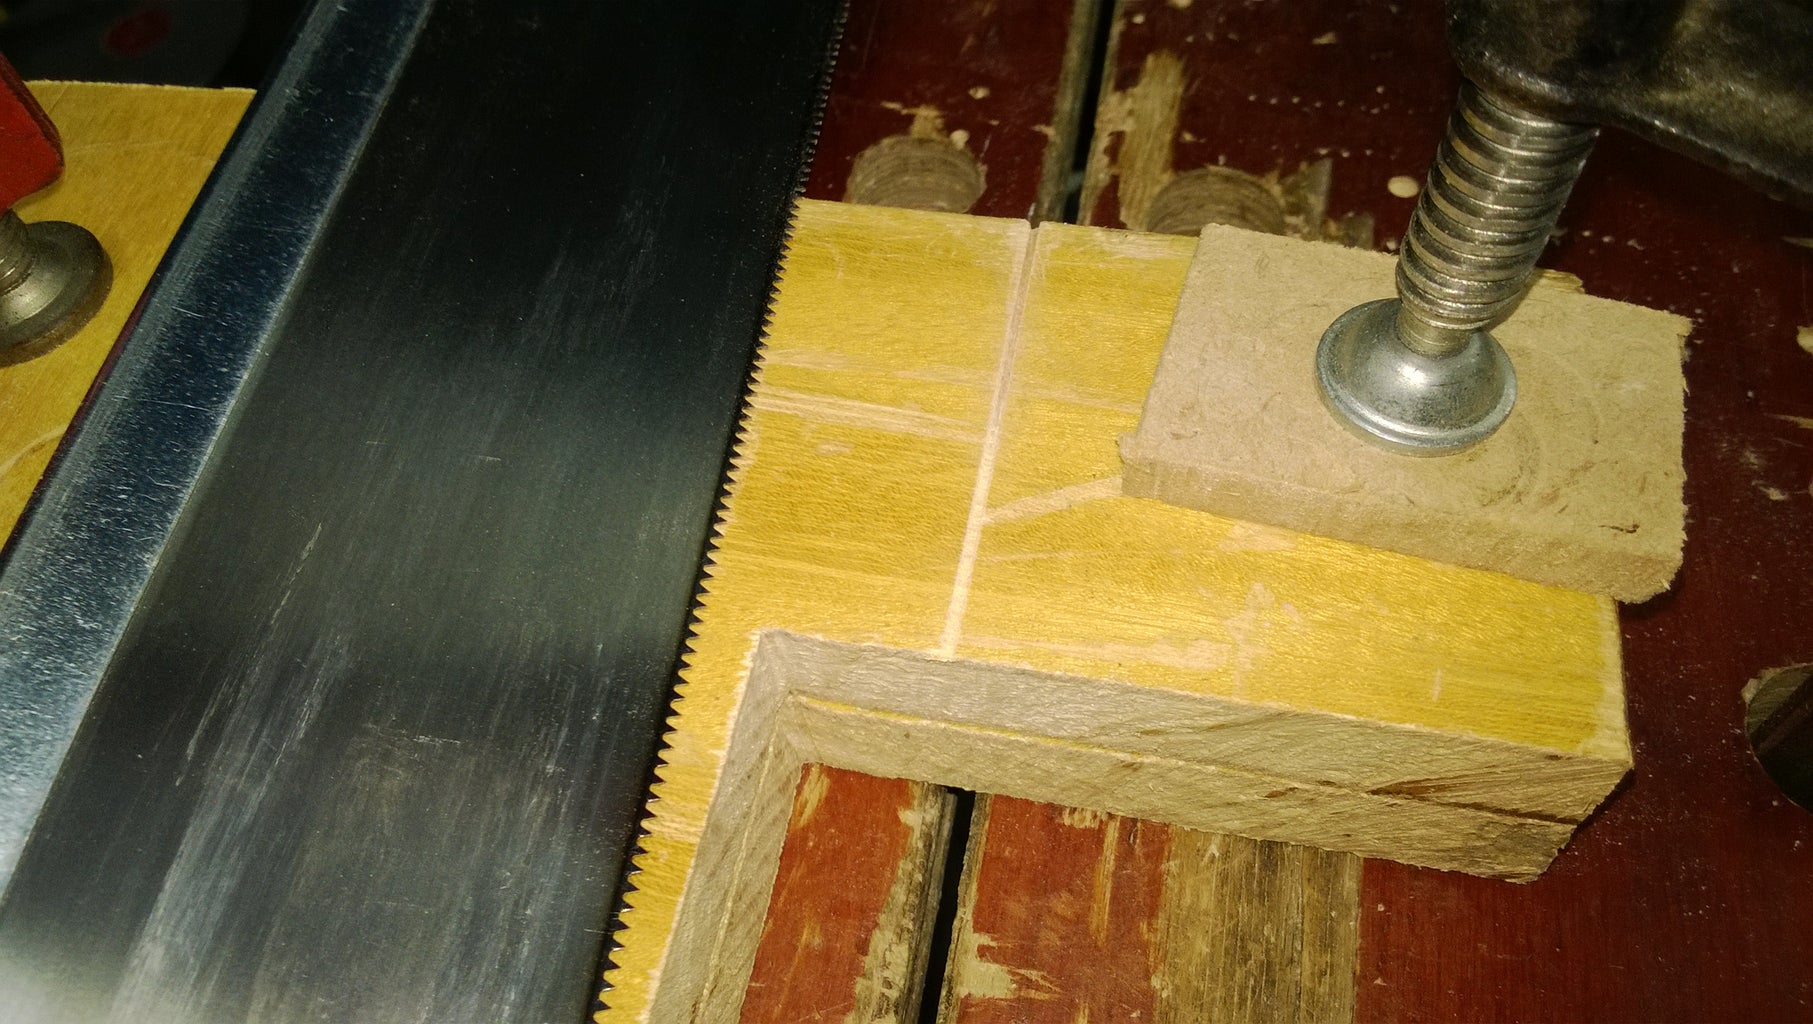 Making the Mitre Box